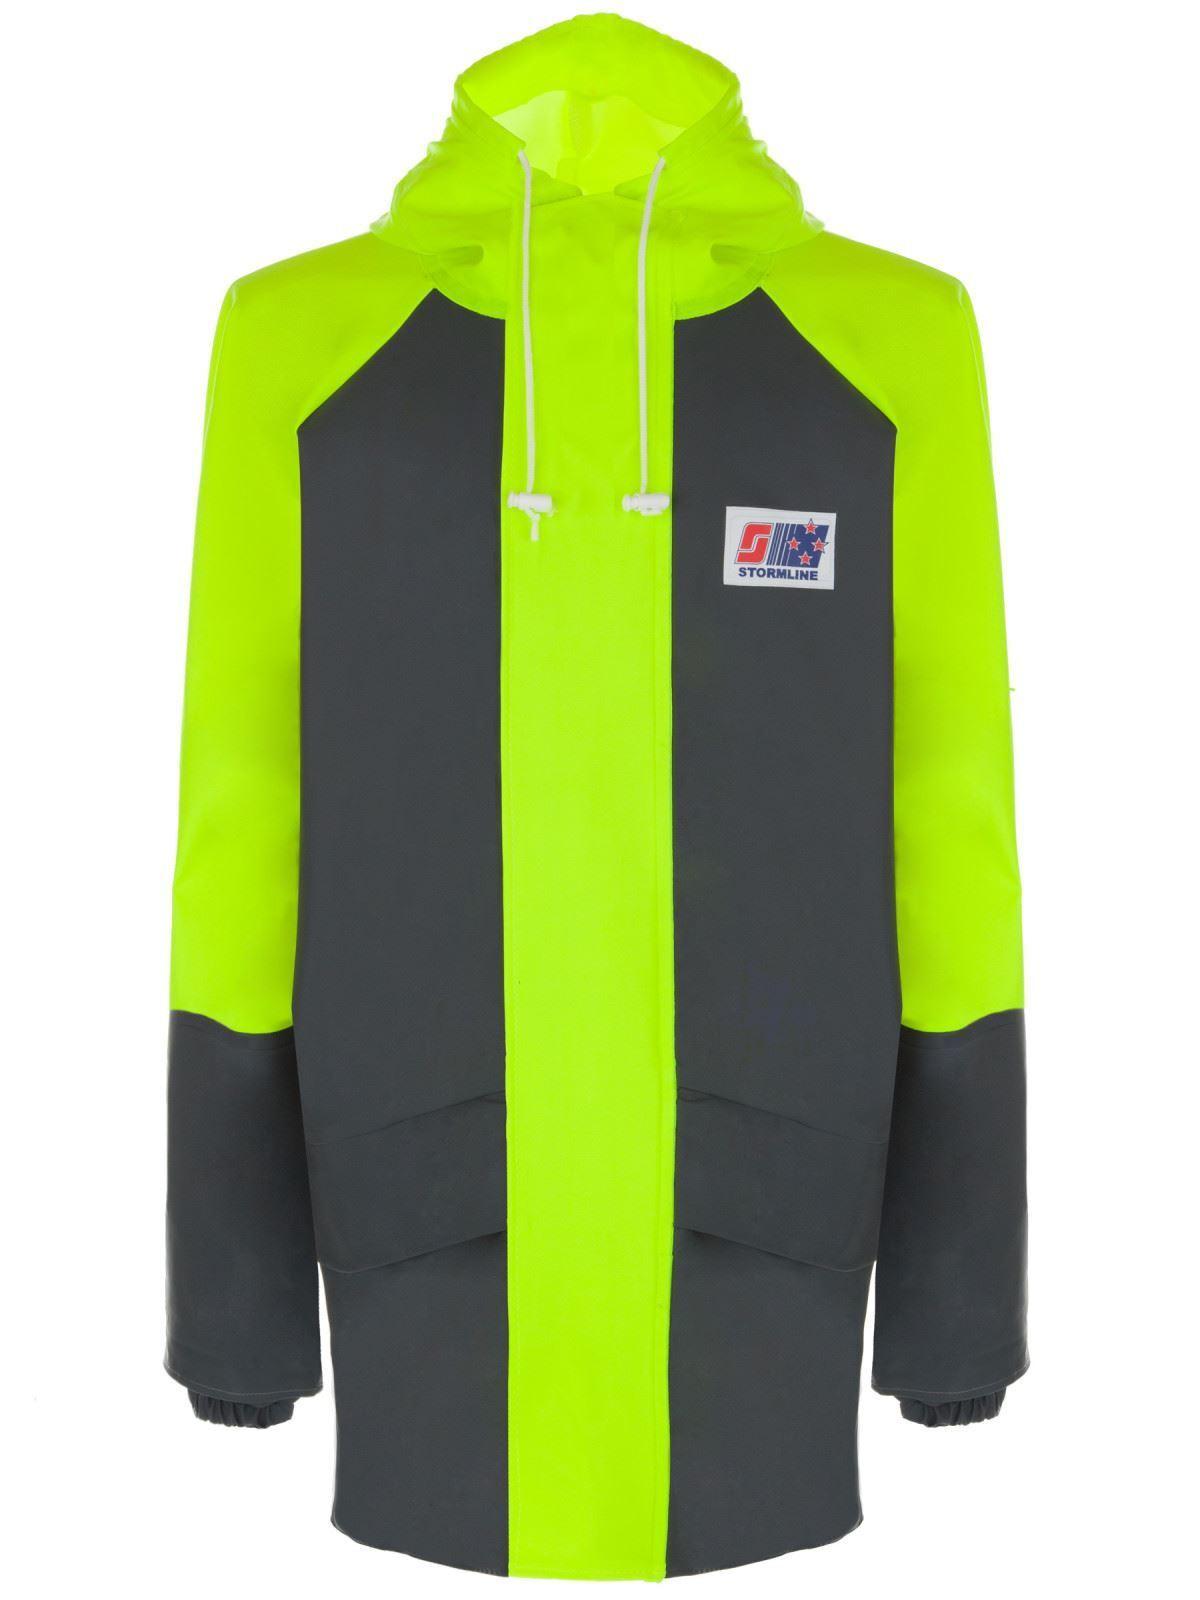 stormline stormtex Air Jacket (pesca comercial clima húmedo Impermeable)